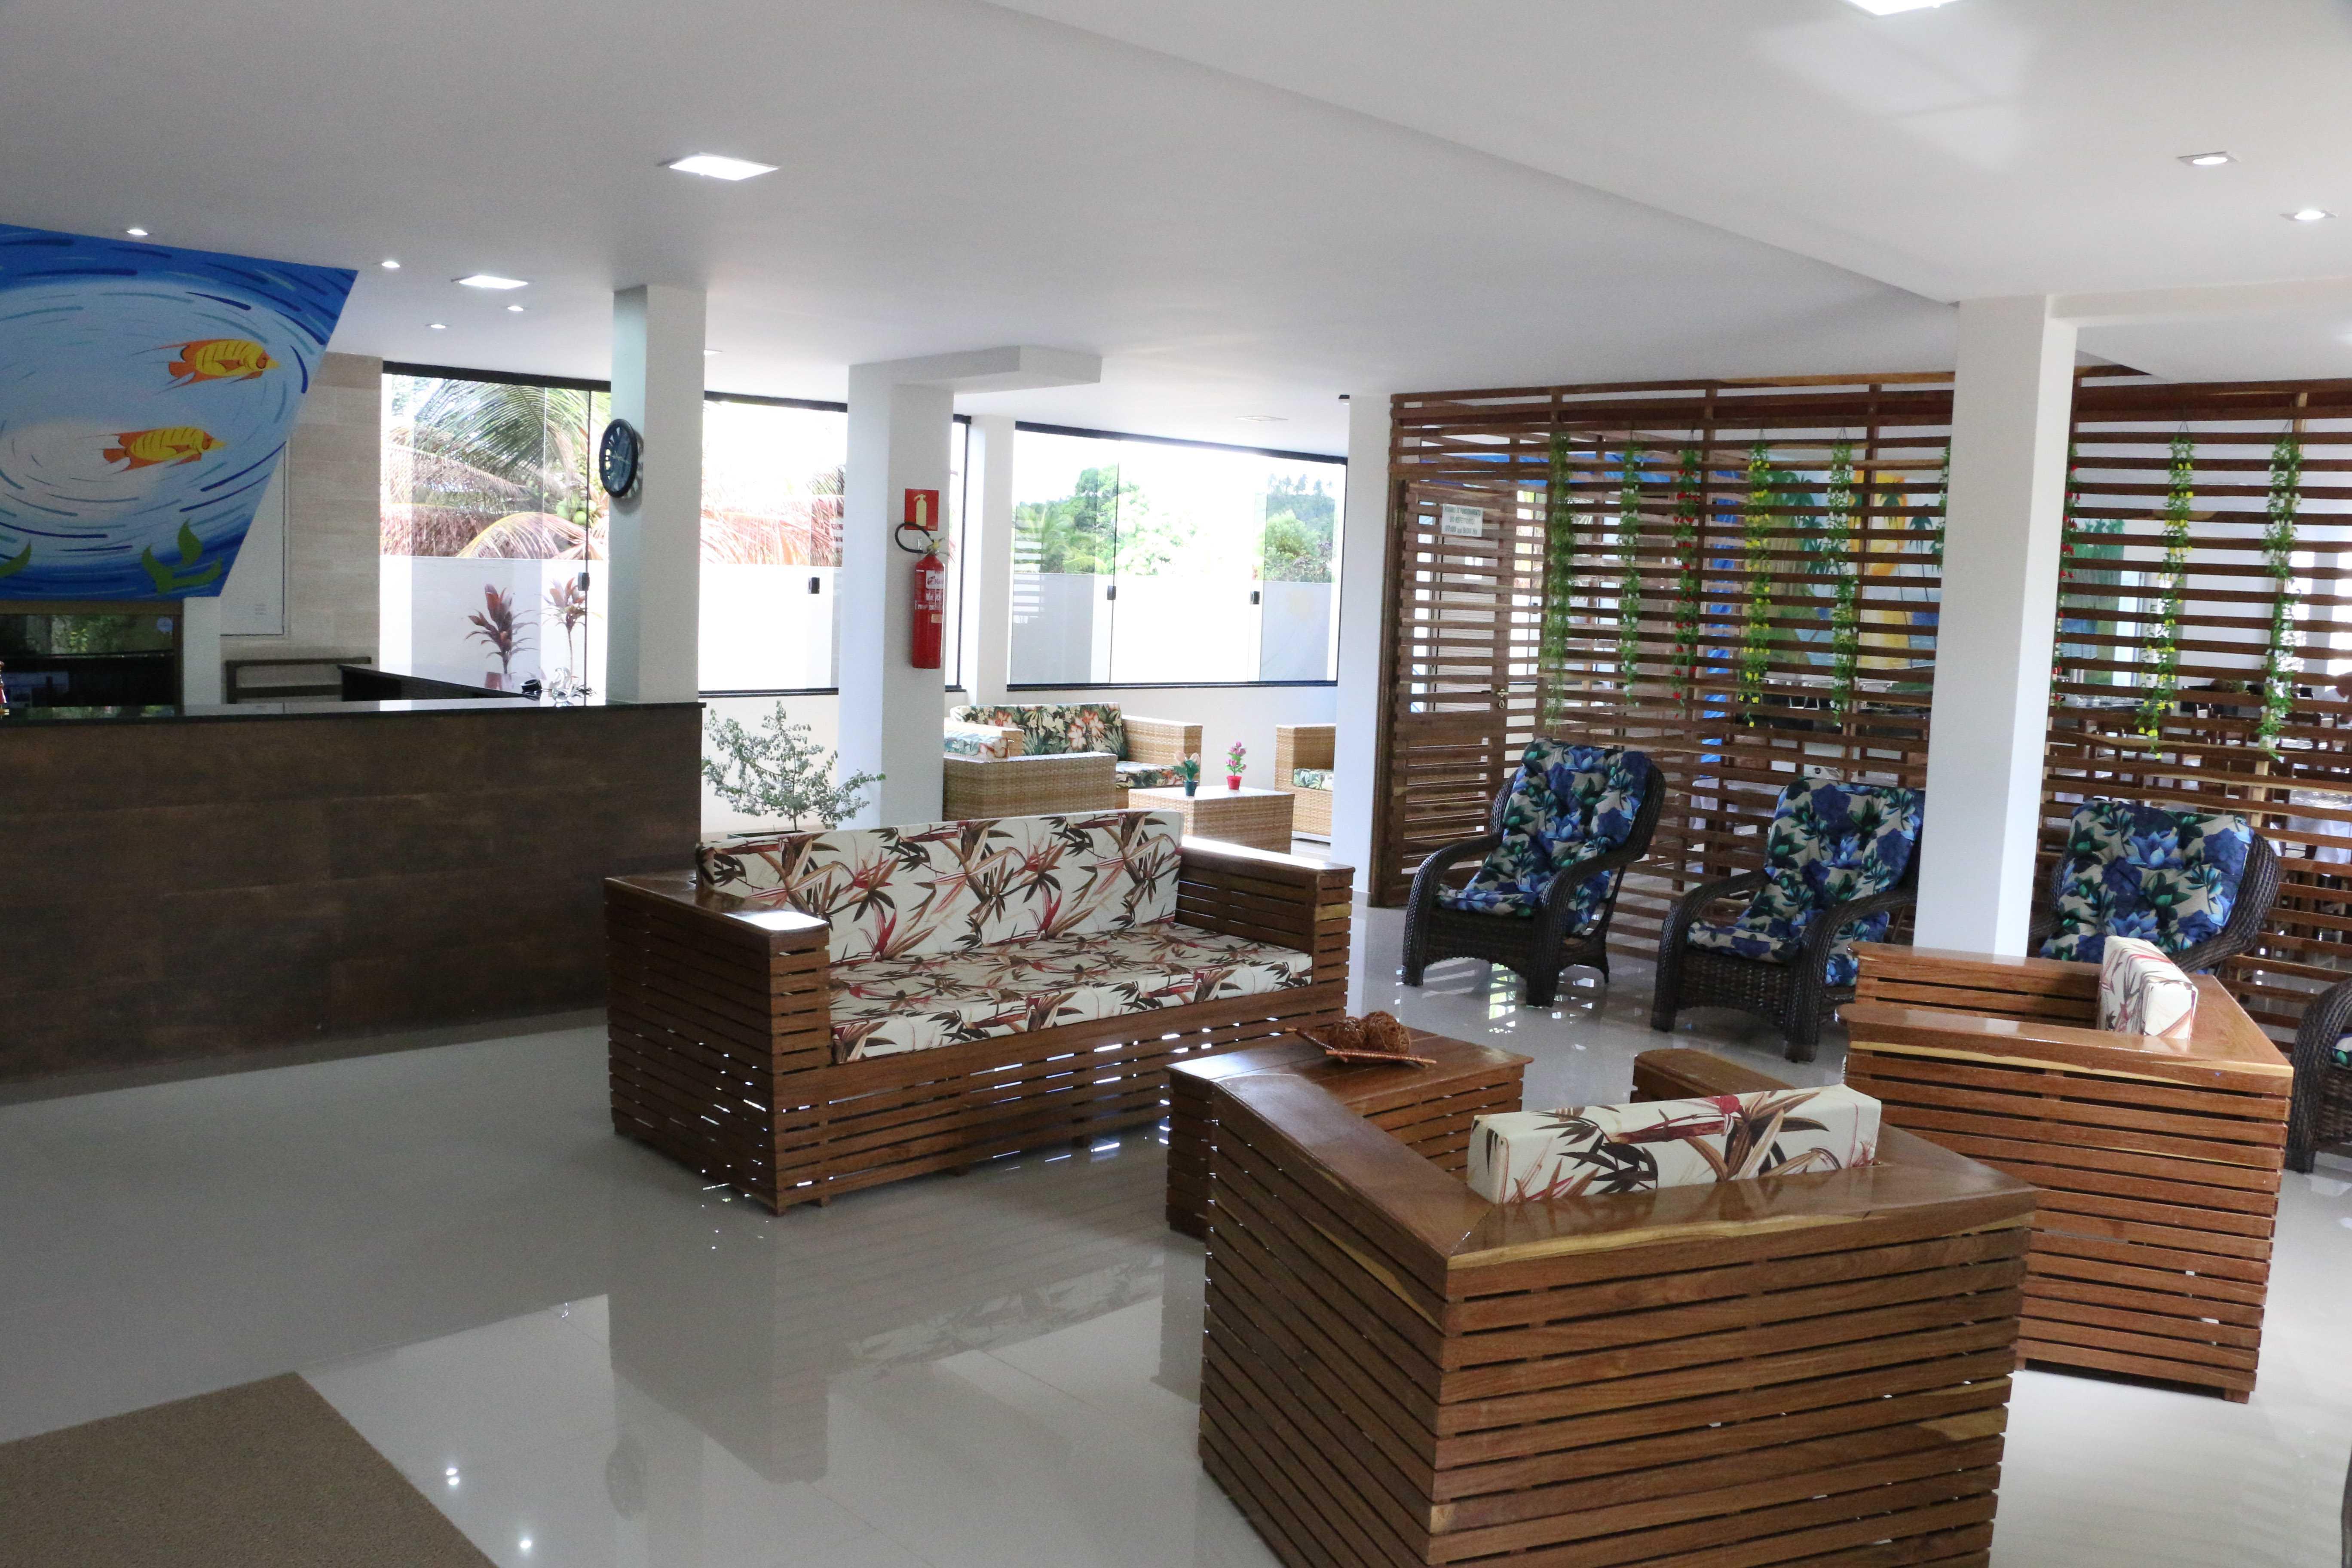 Recepção / Sala Lounge